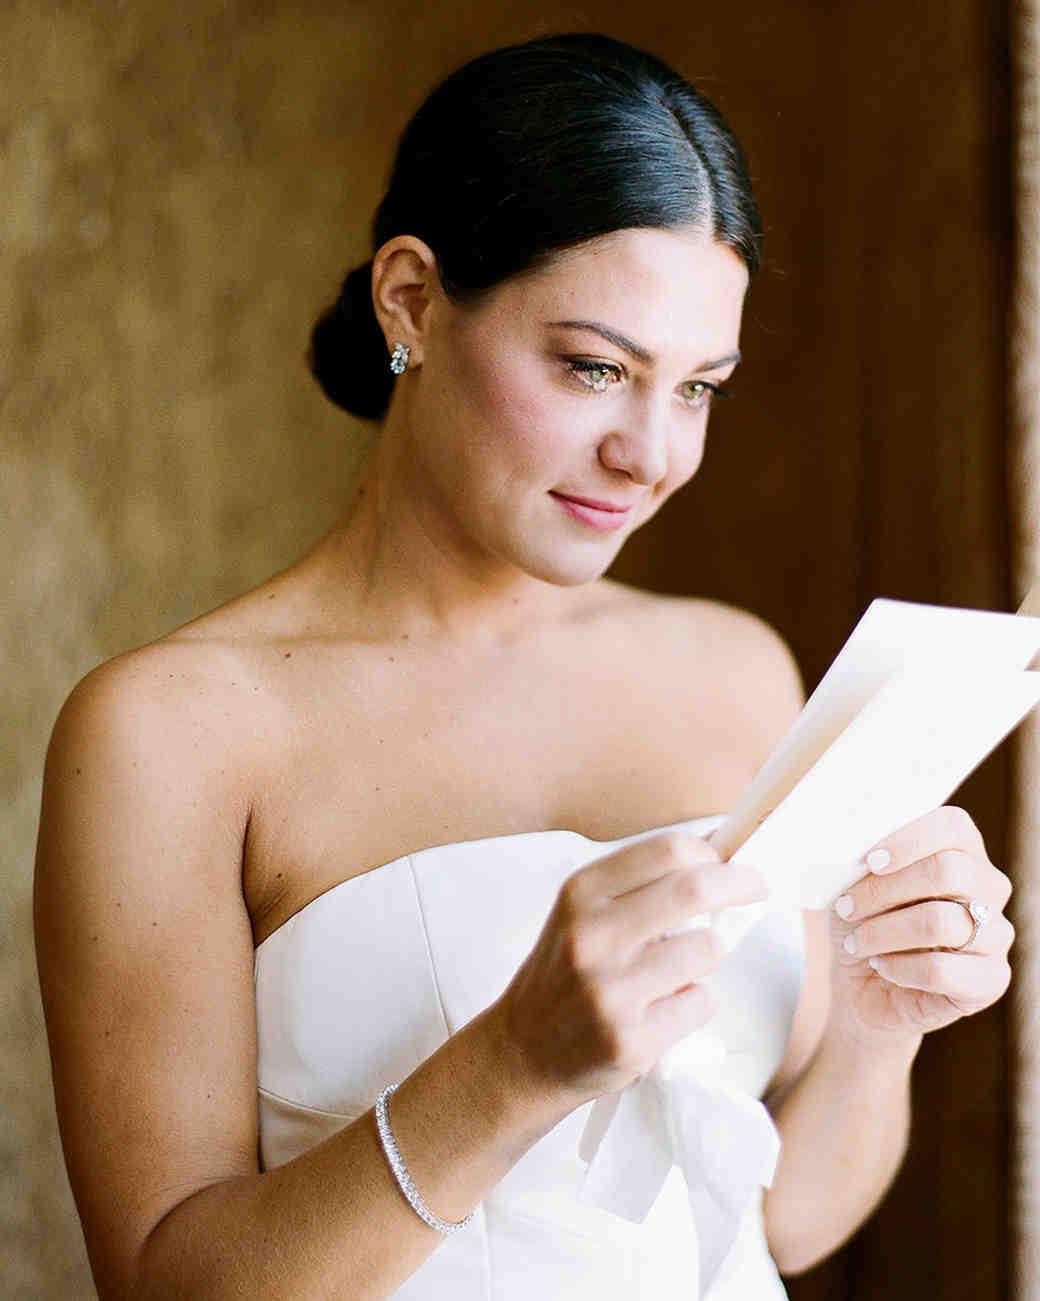 jamie jon wedding tearful bride reading note